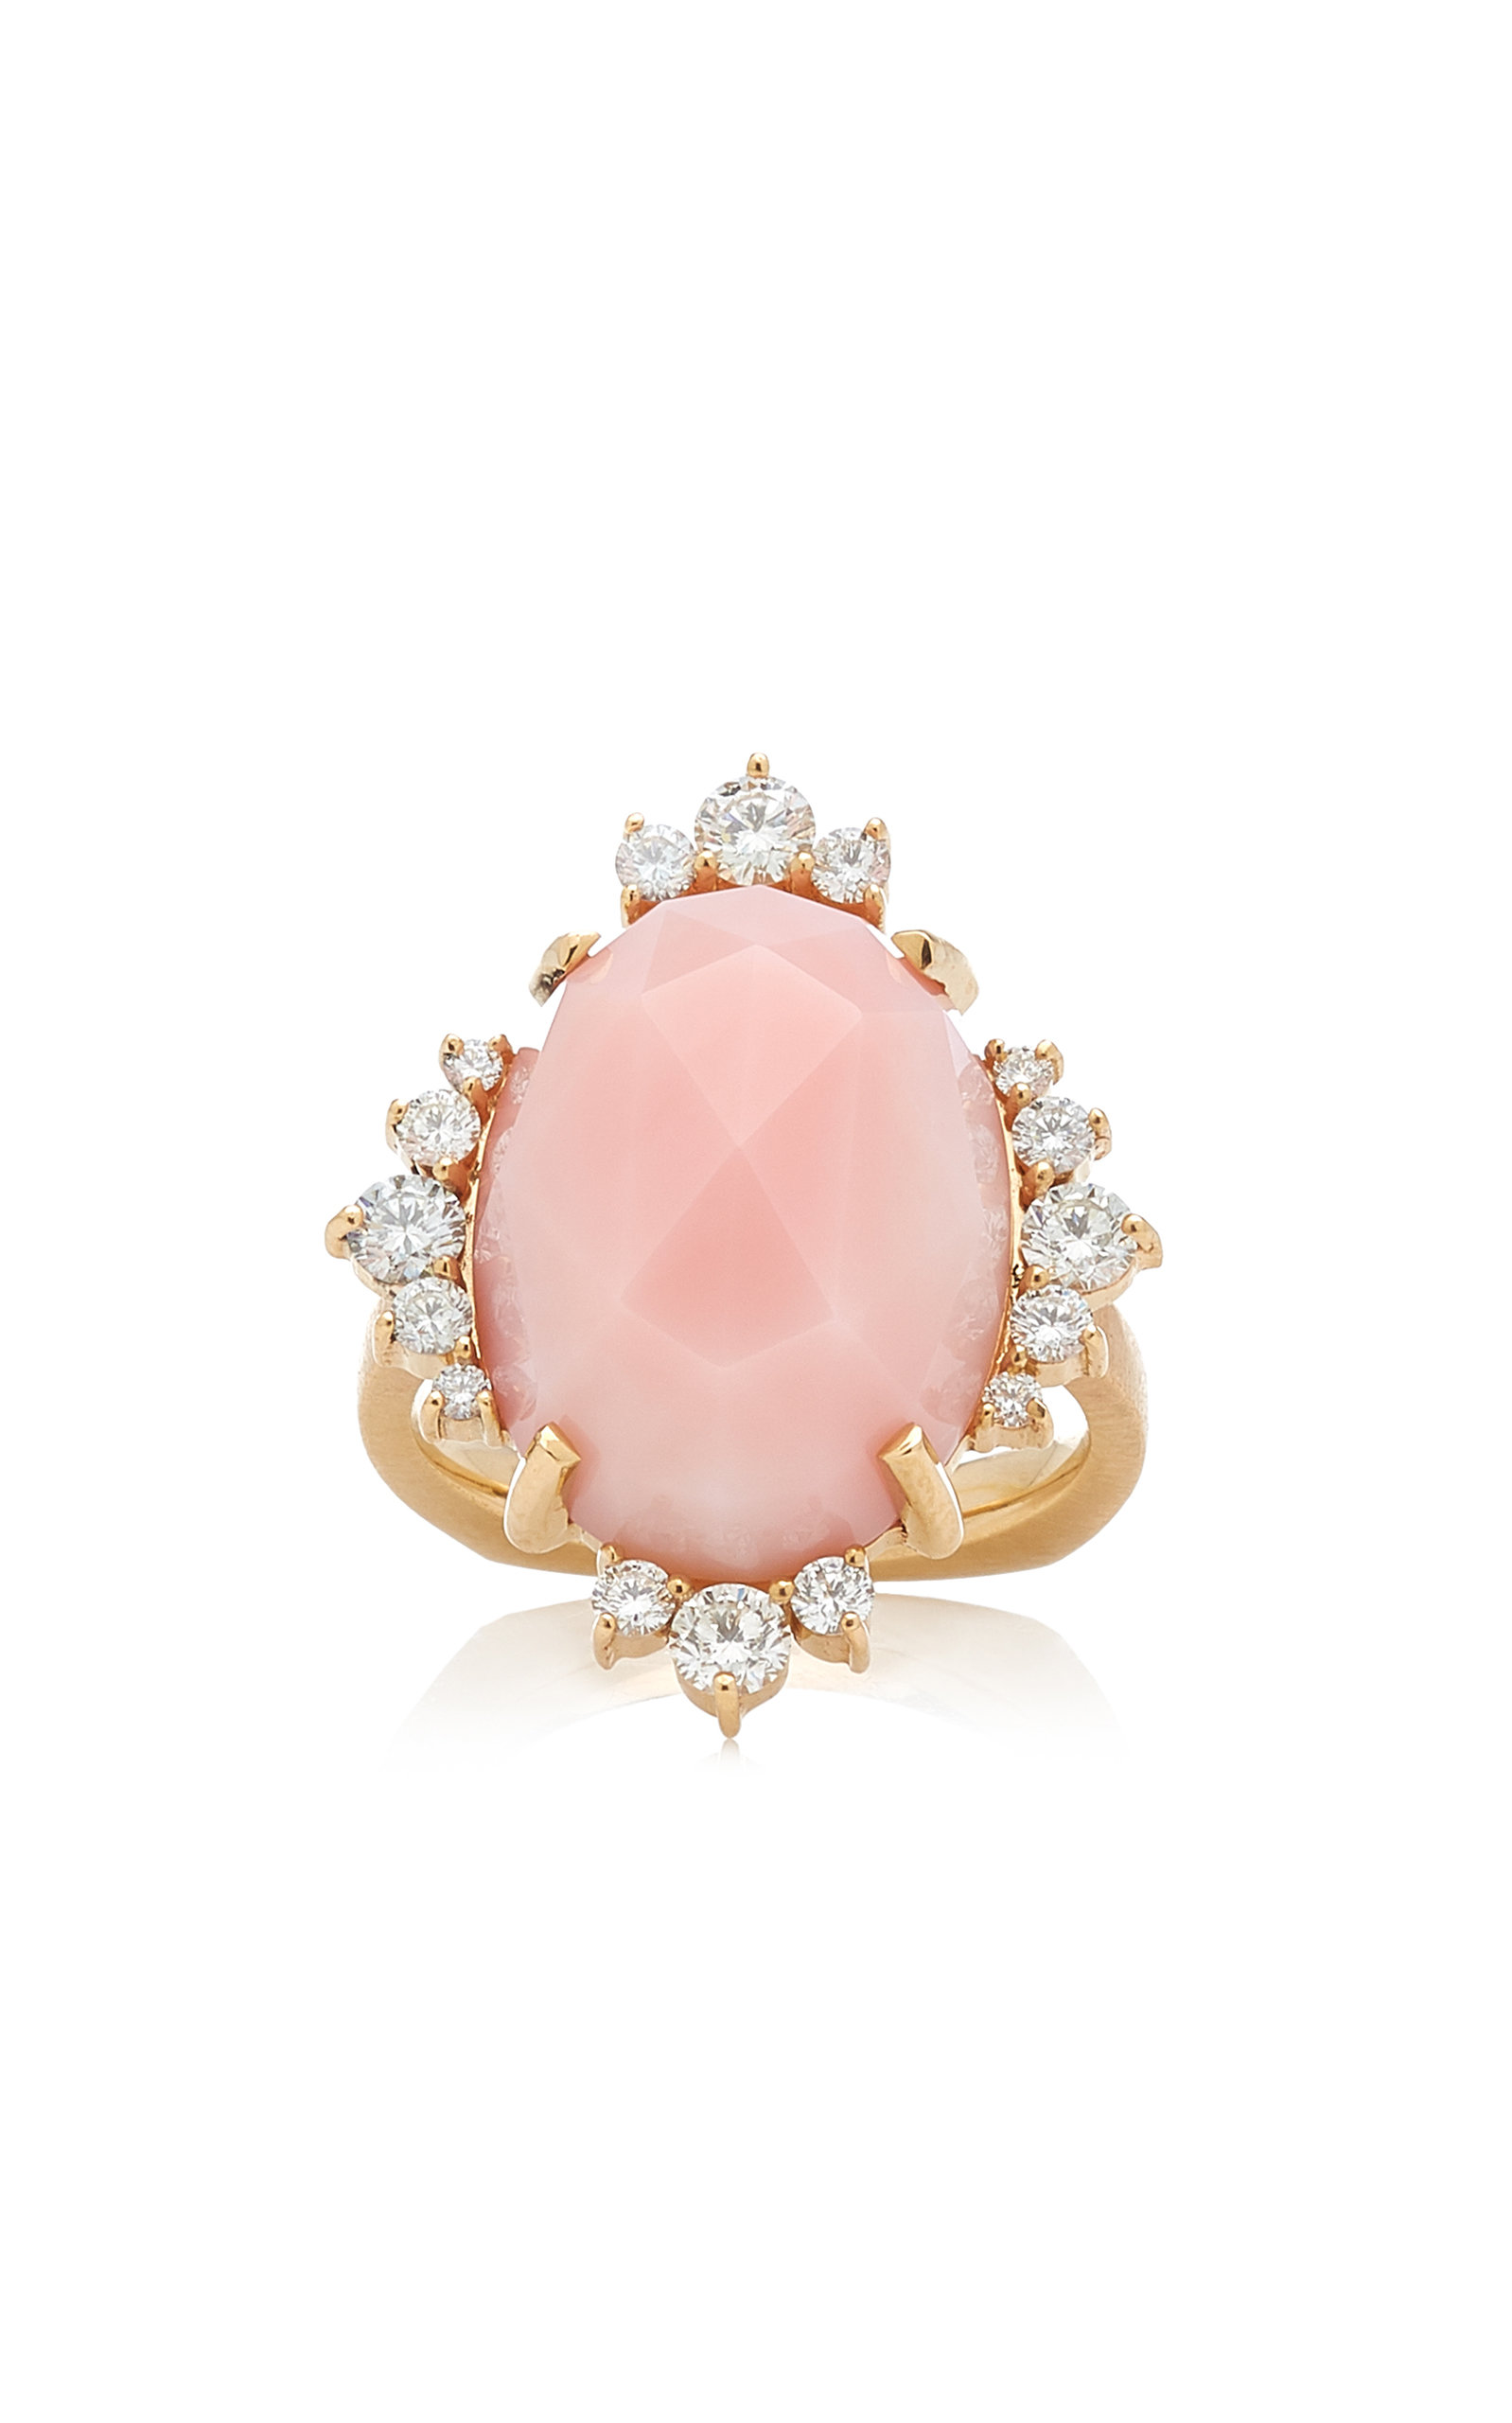 Women's Halo 14K Yellow Gold Opal and Diamond Ring